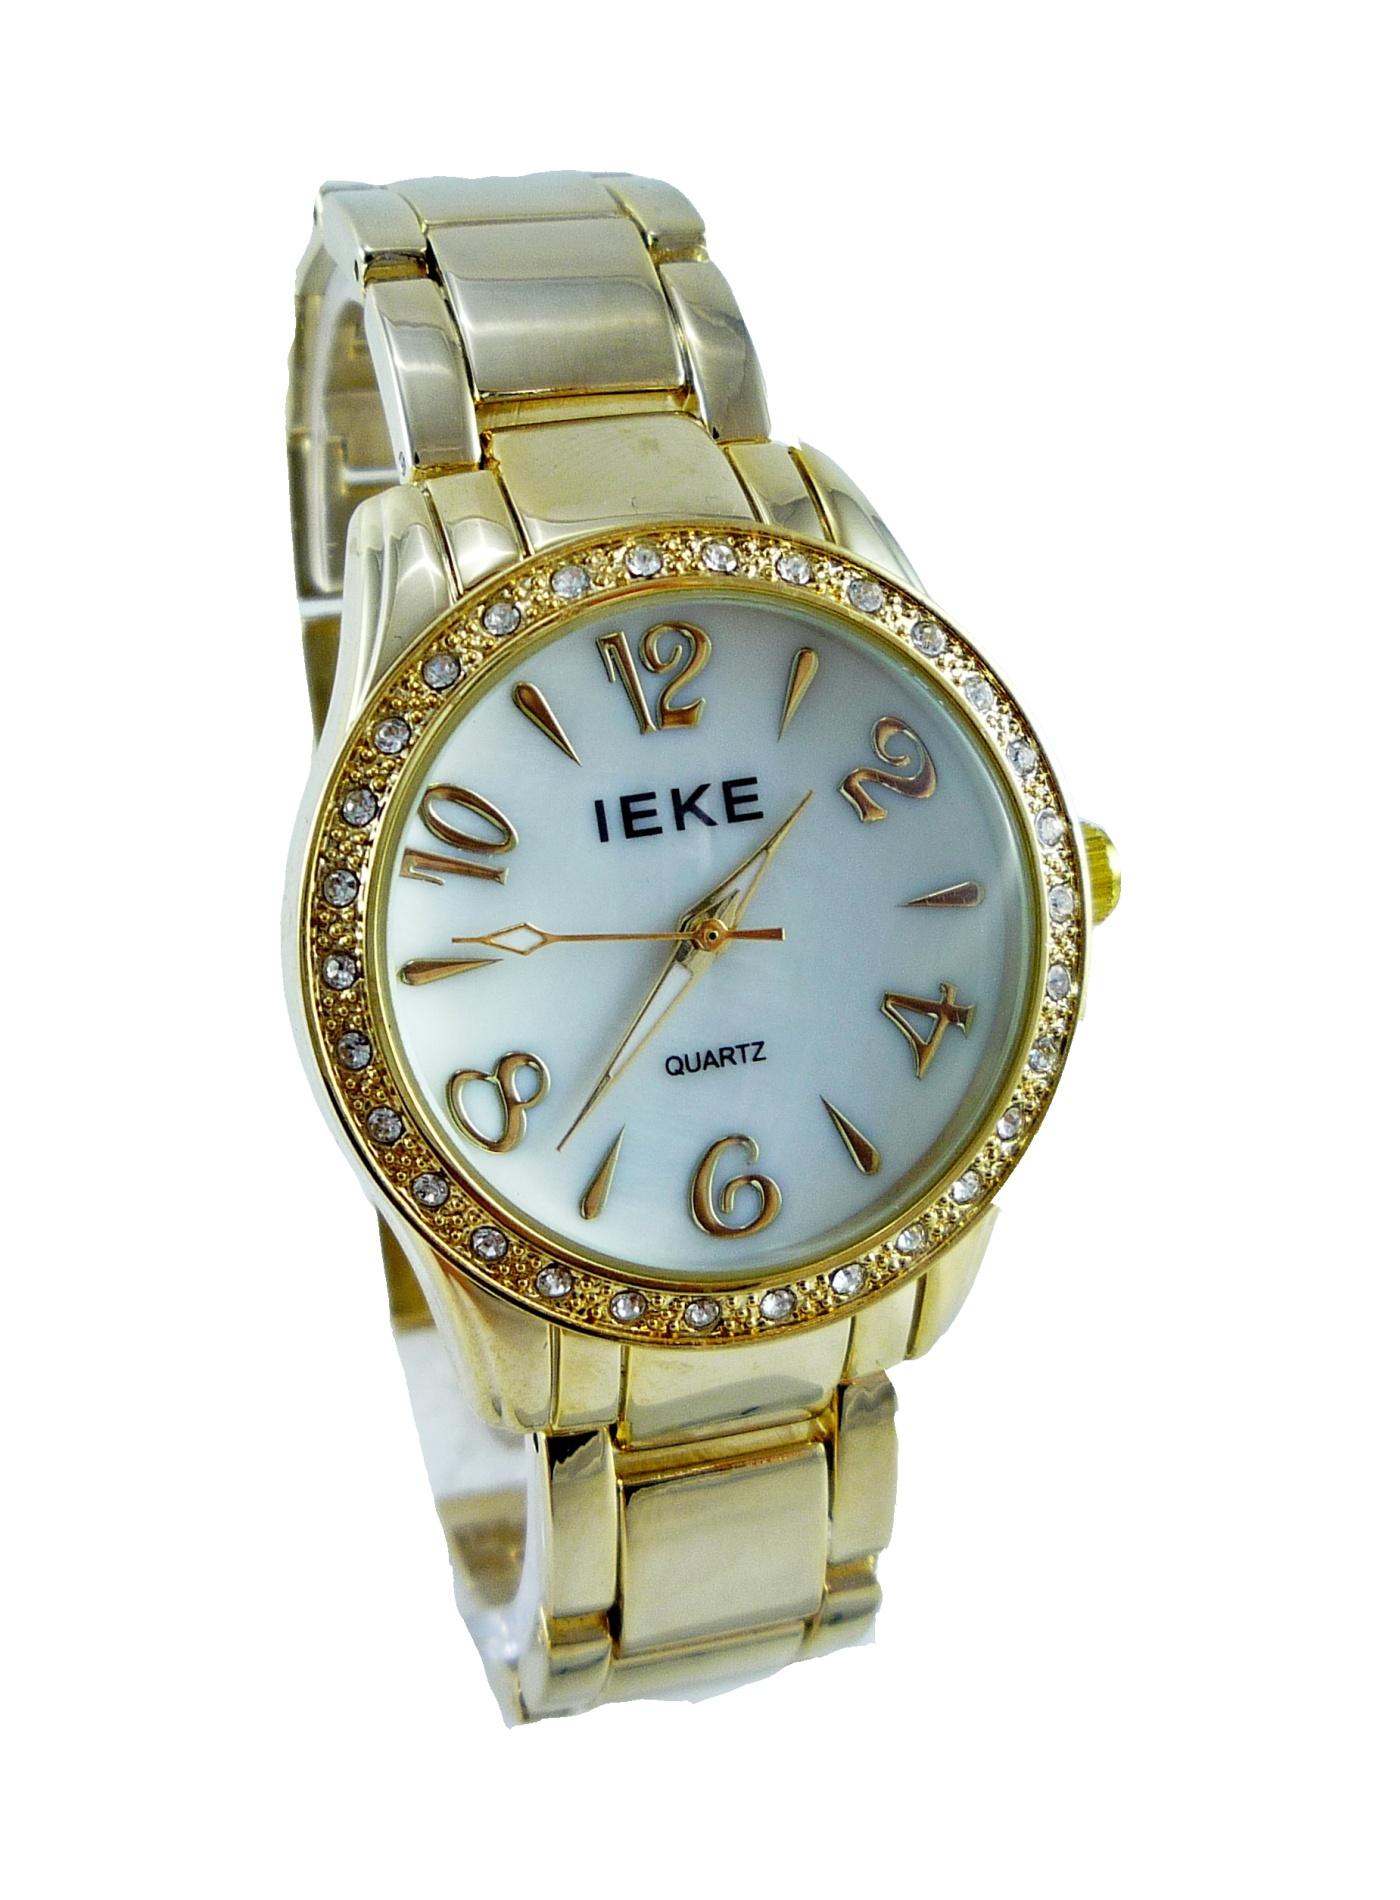 Dámské hodinky IEKE Temply zlaté 189D 106a582c85